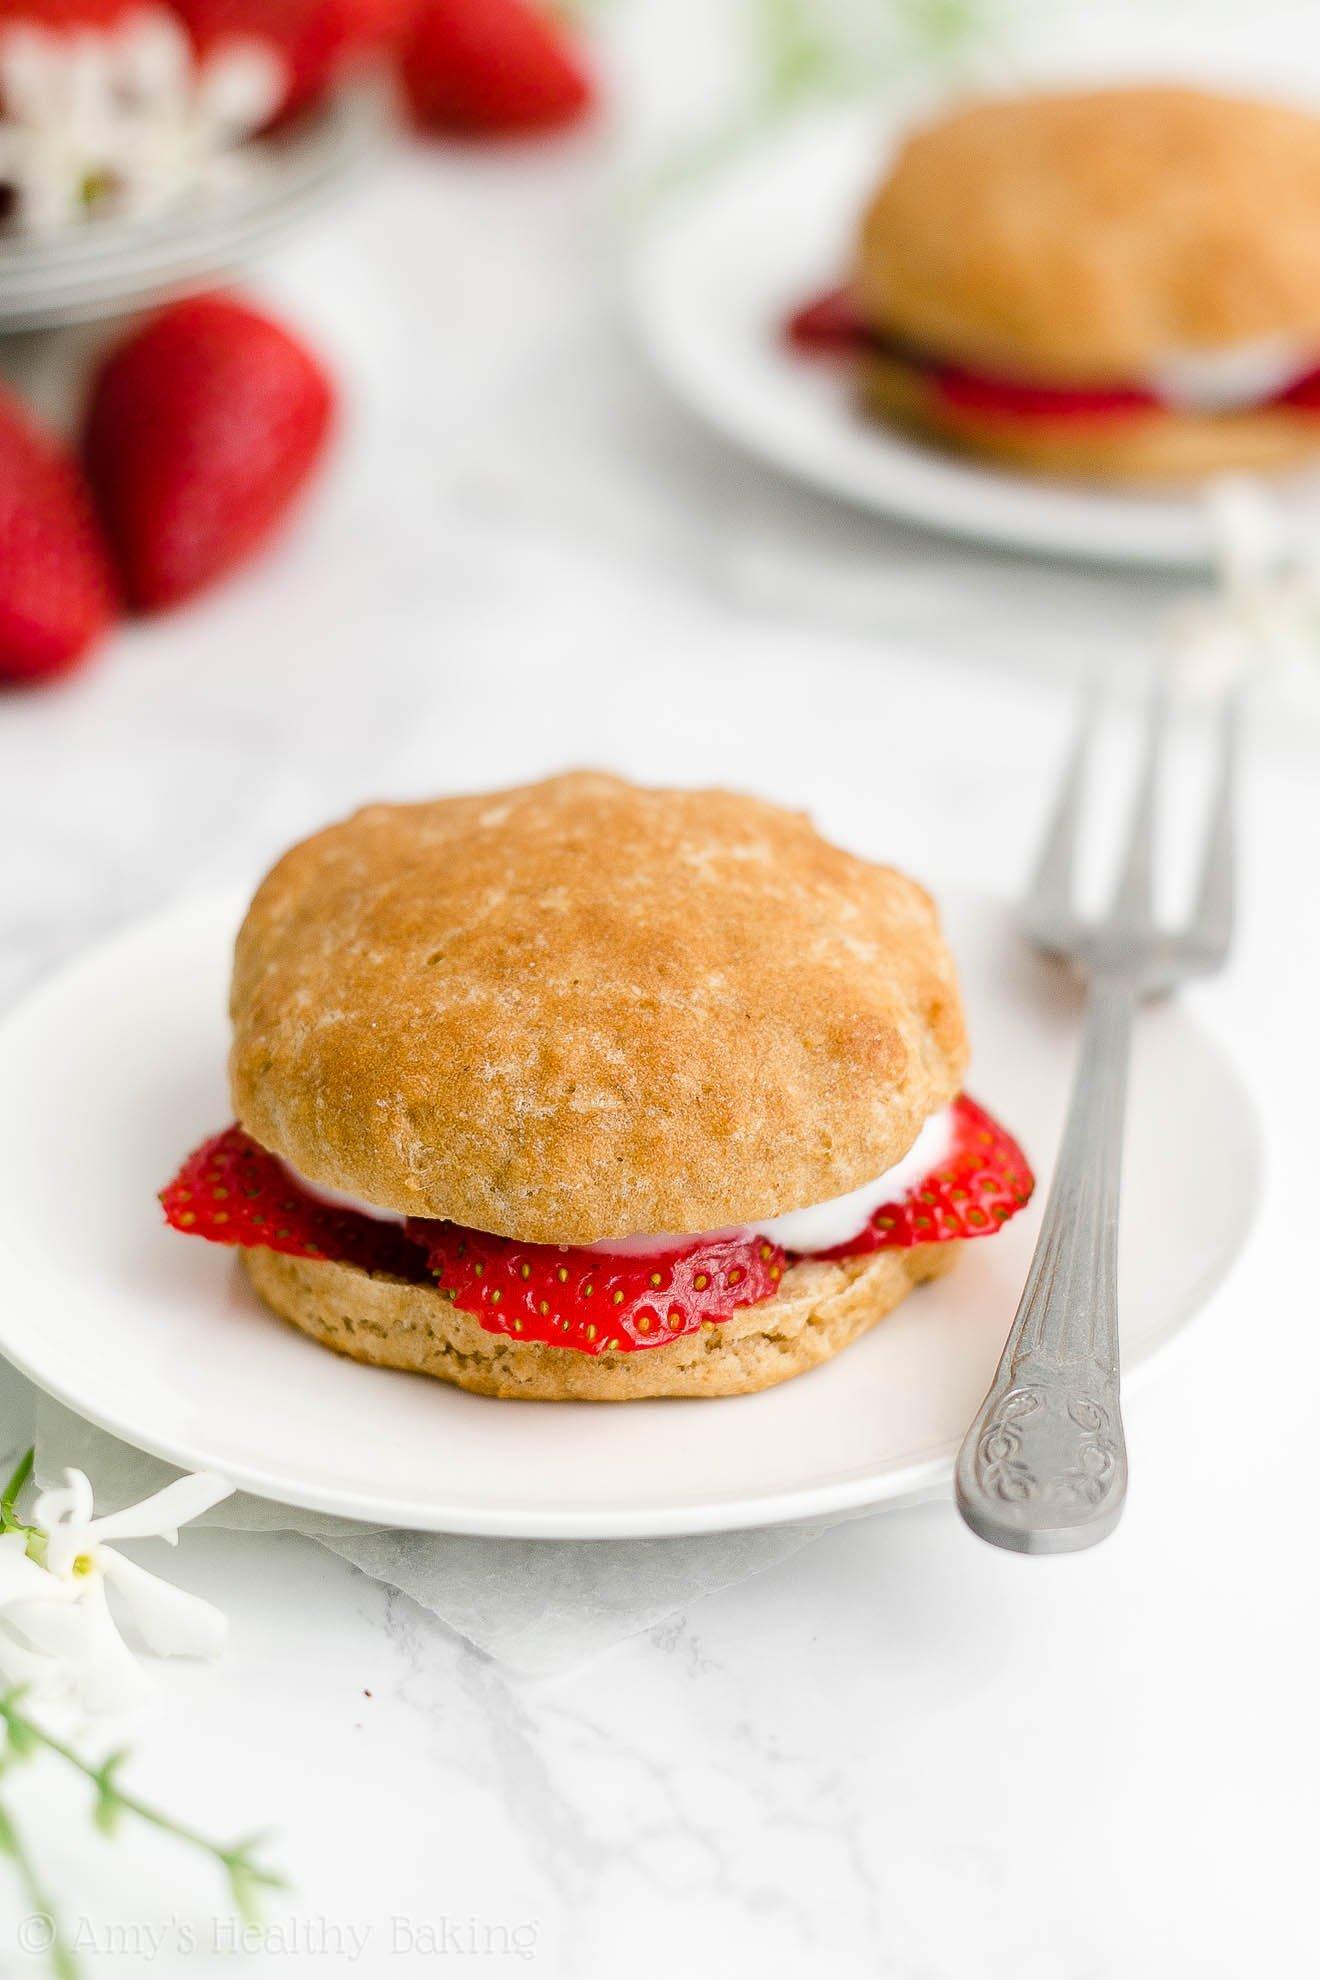 Best Easy Healthy Low Sugar Gluten Free Vegan Strawberry Shortcakes No Eggs